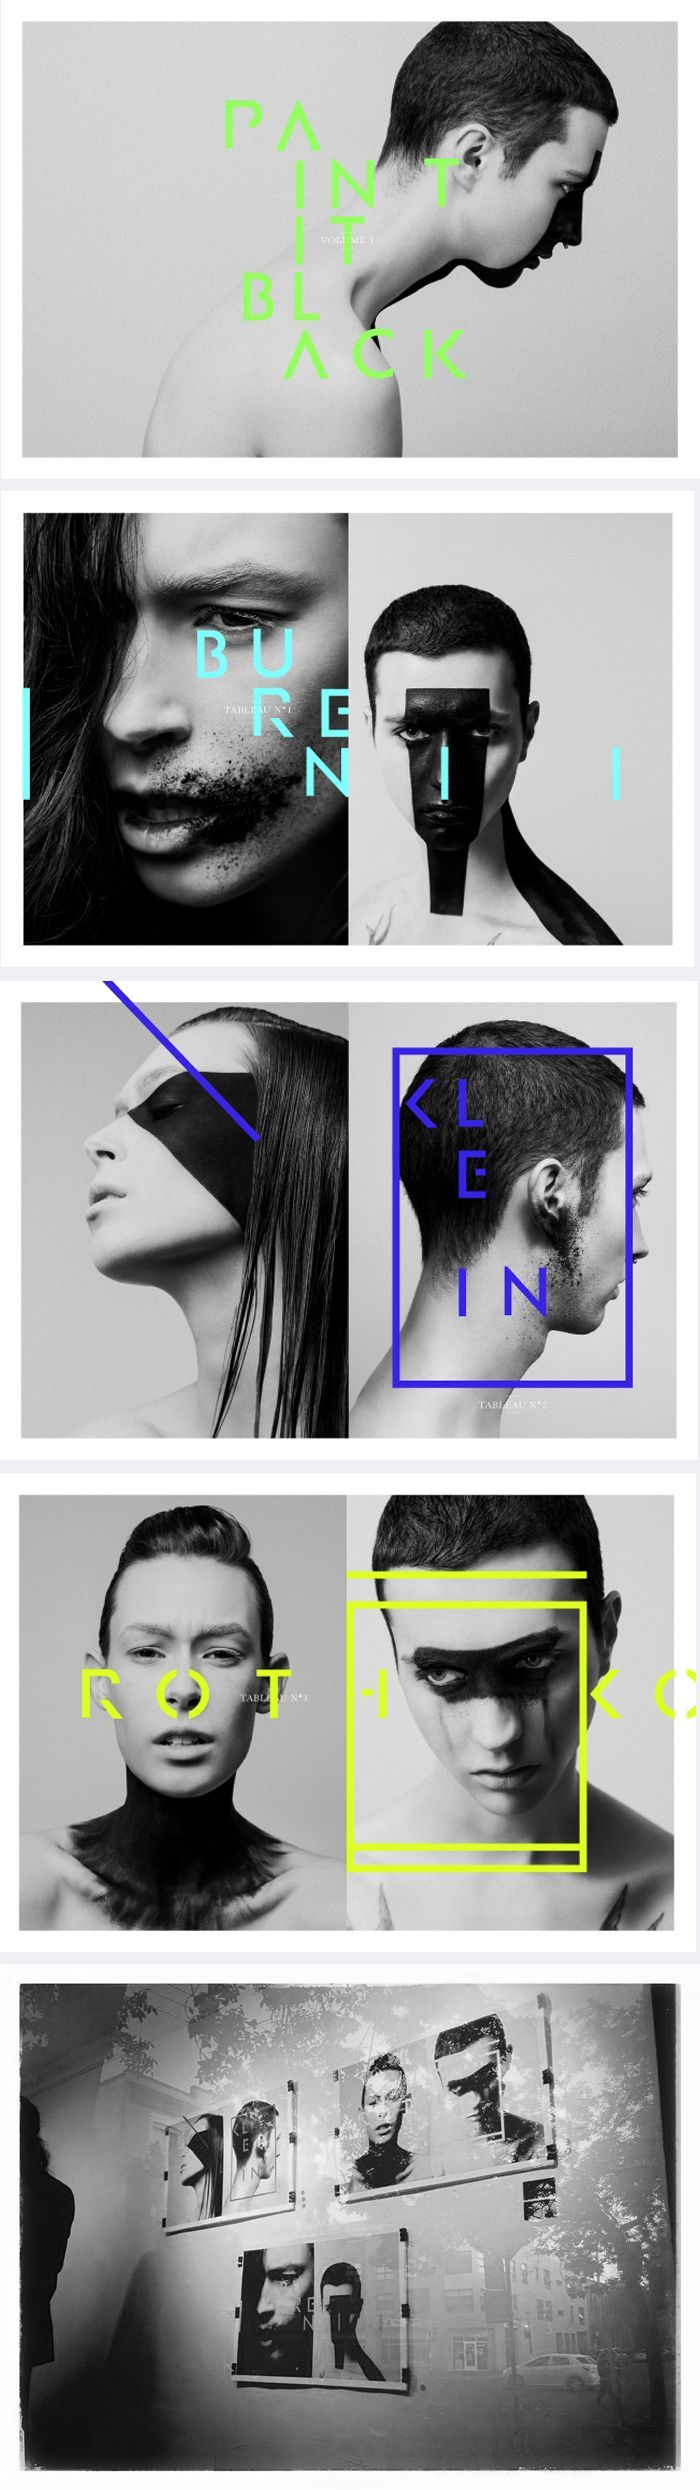 Paint it Black - edito beauté - Beauty editorial - artist make up maquillage…